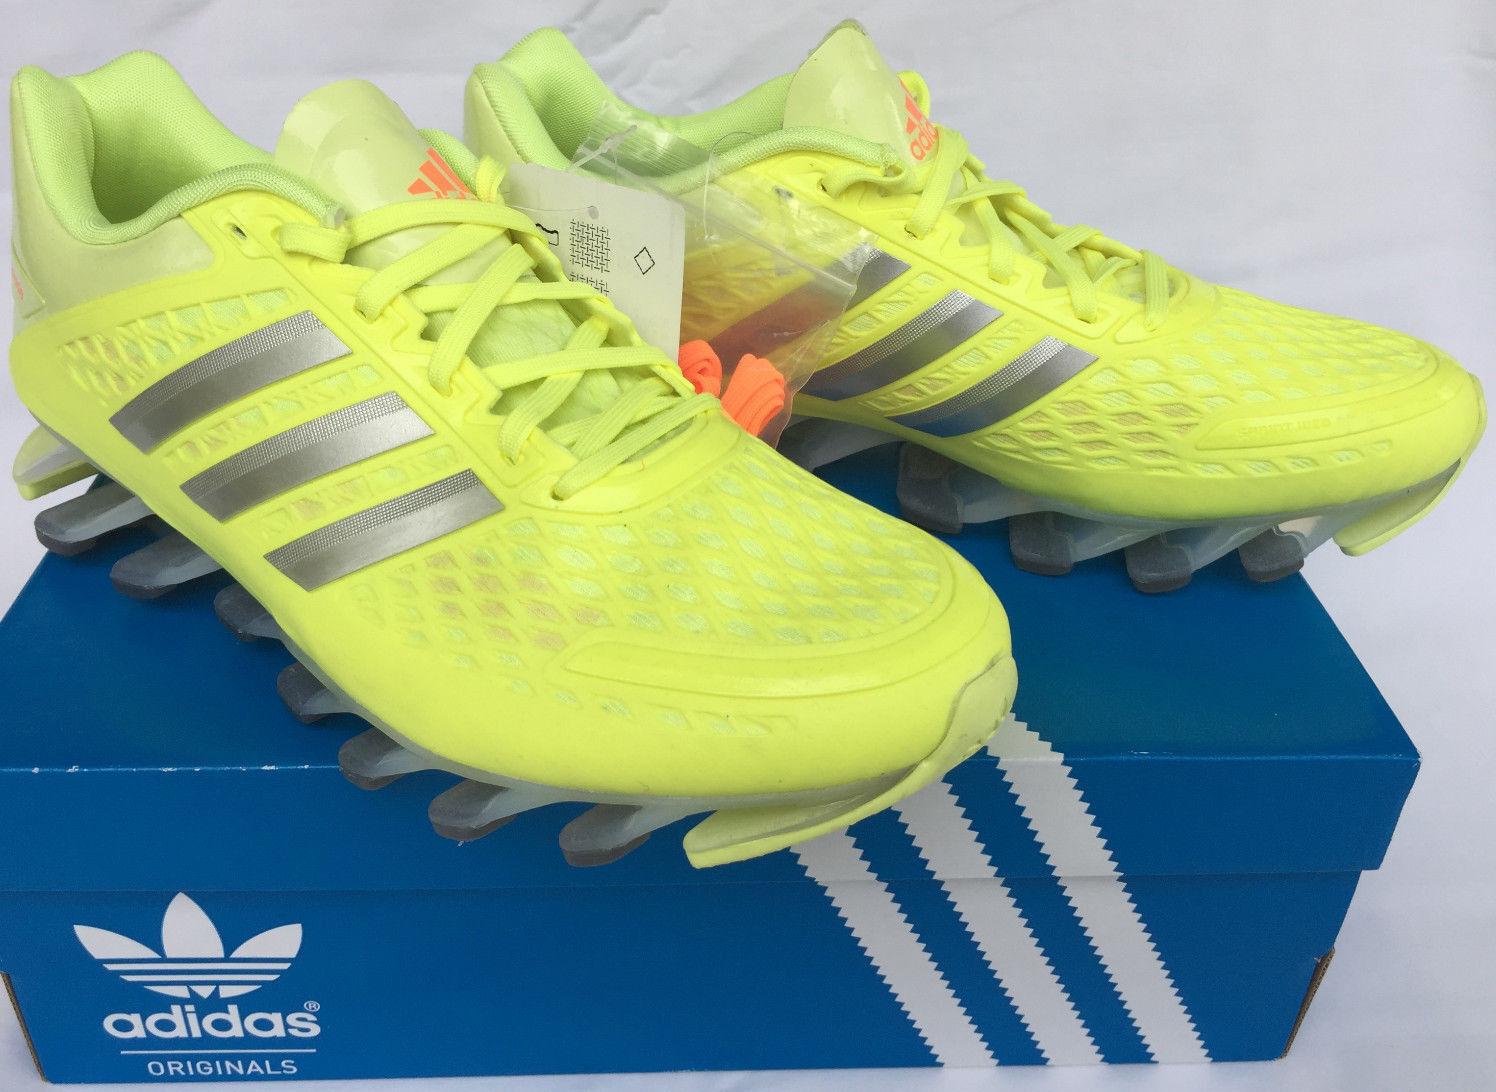 Adidas Springblade Razor W M20200 Glow Silver Marathon Running shoes Women's 8.5